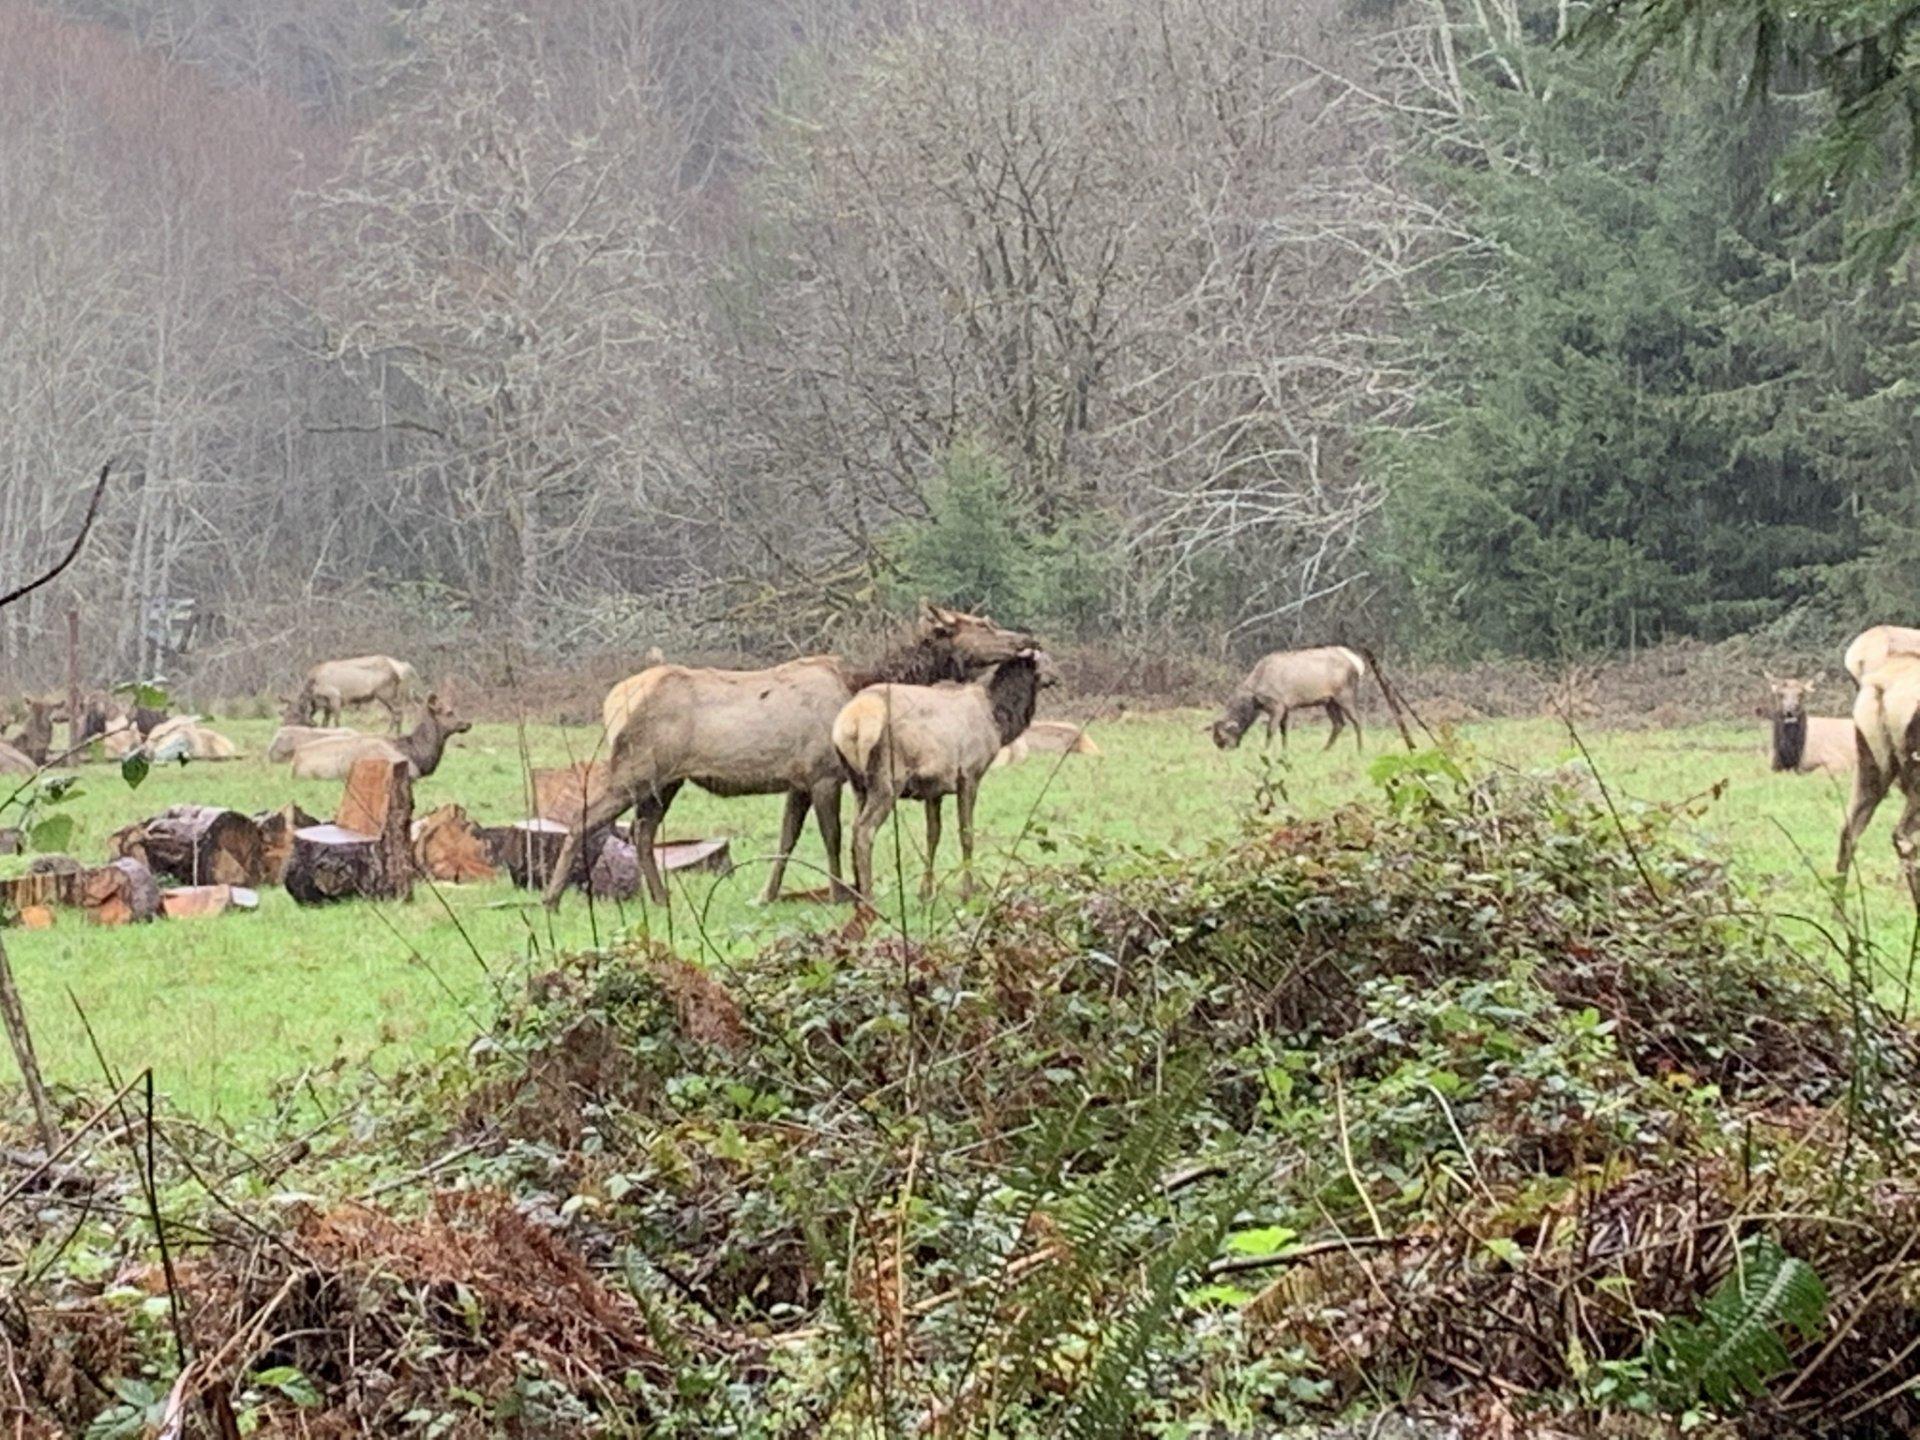 Elk forage near McDonald Creek in Orick, California.